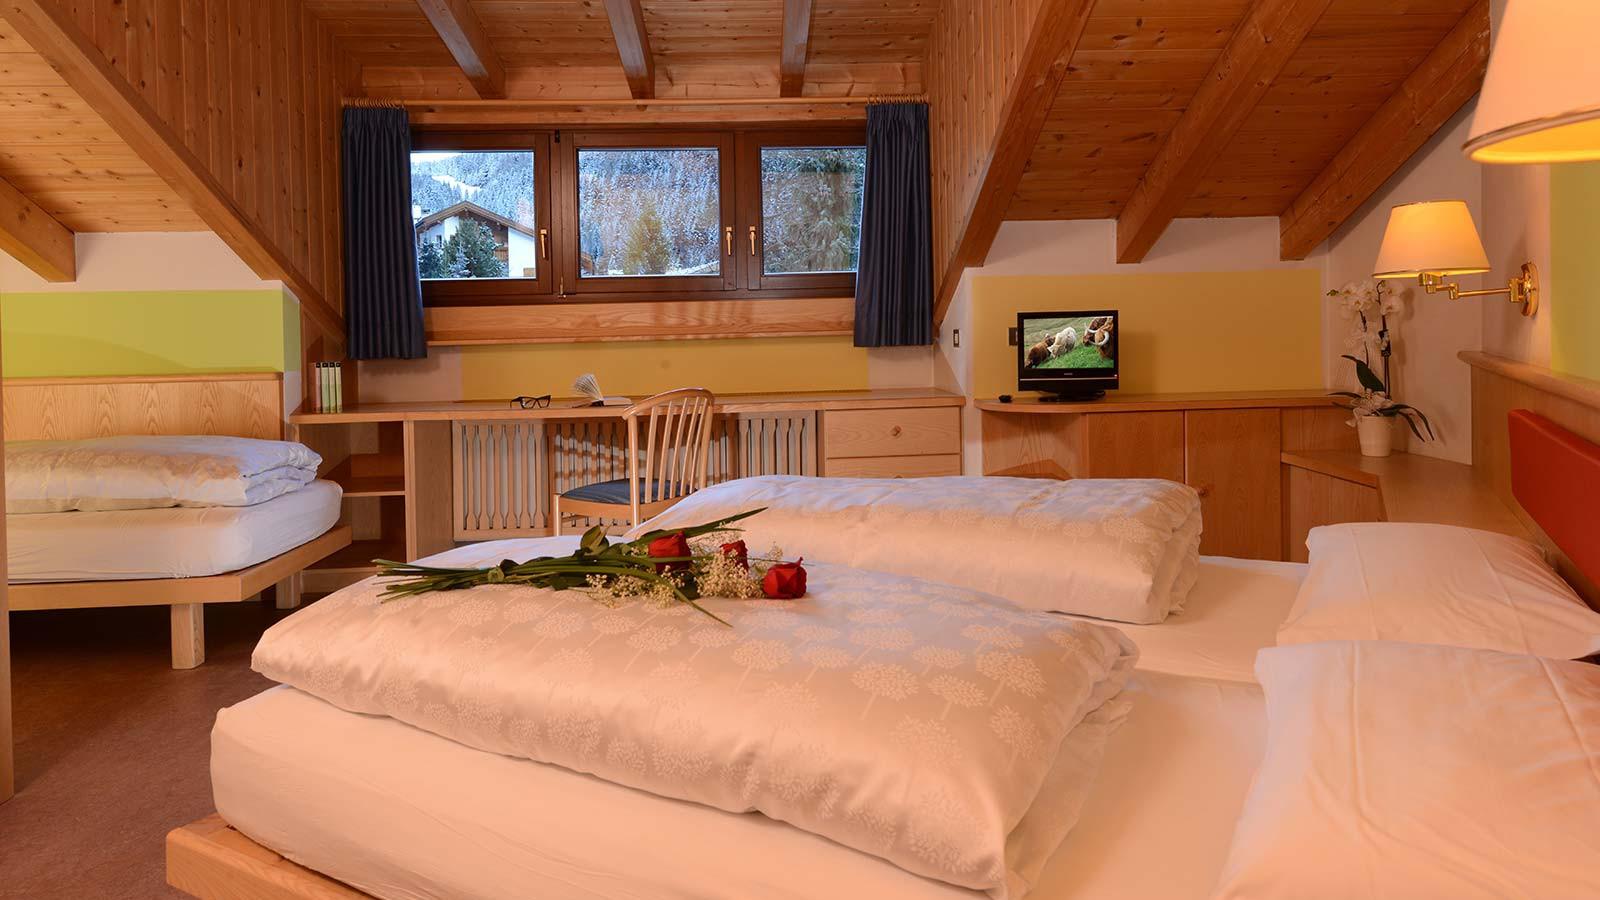 Hotel Alpin Haus, Selva Val Gardena - Comfort Room 2